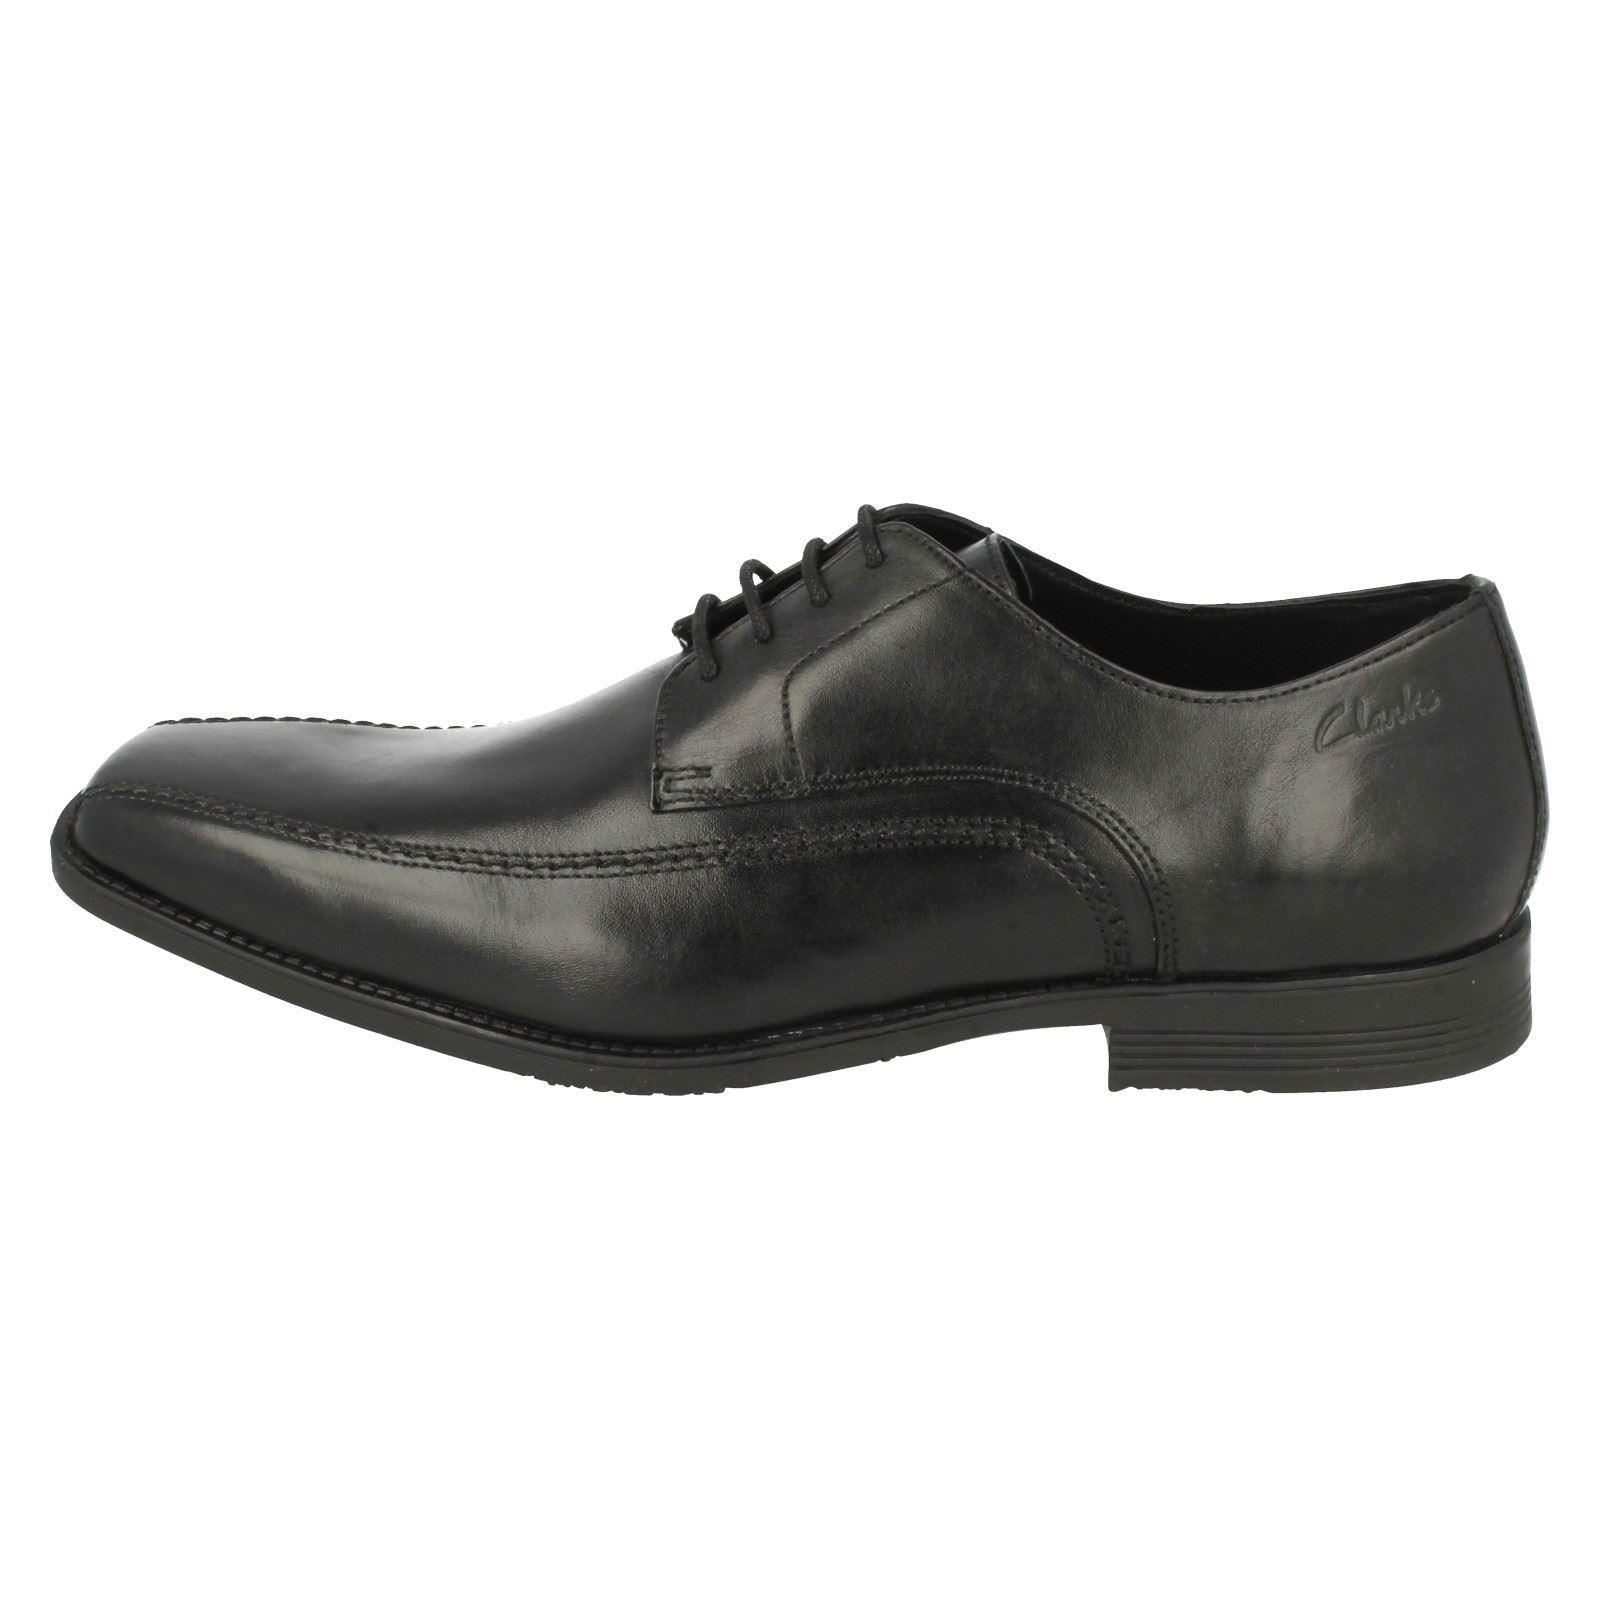 Mens Clarks Formal Shoes Baker Lace